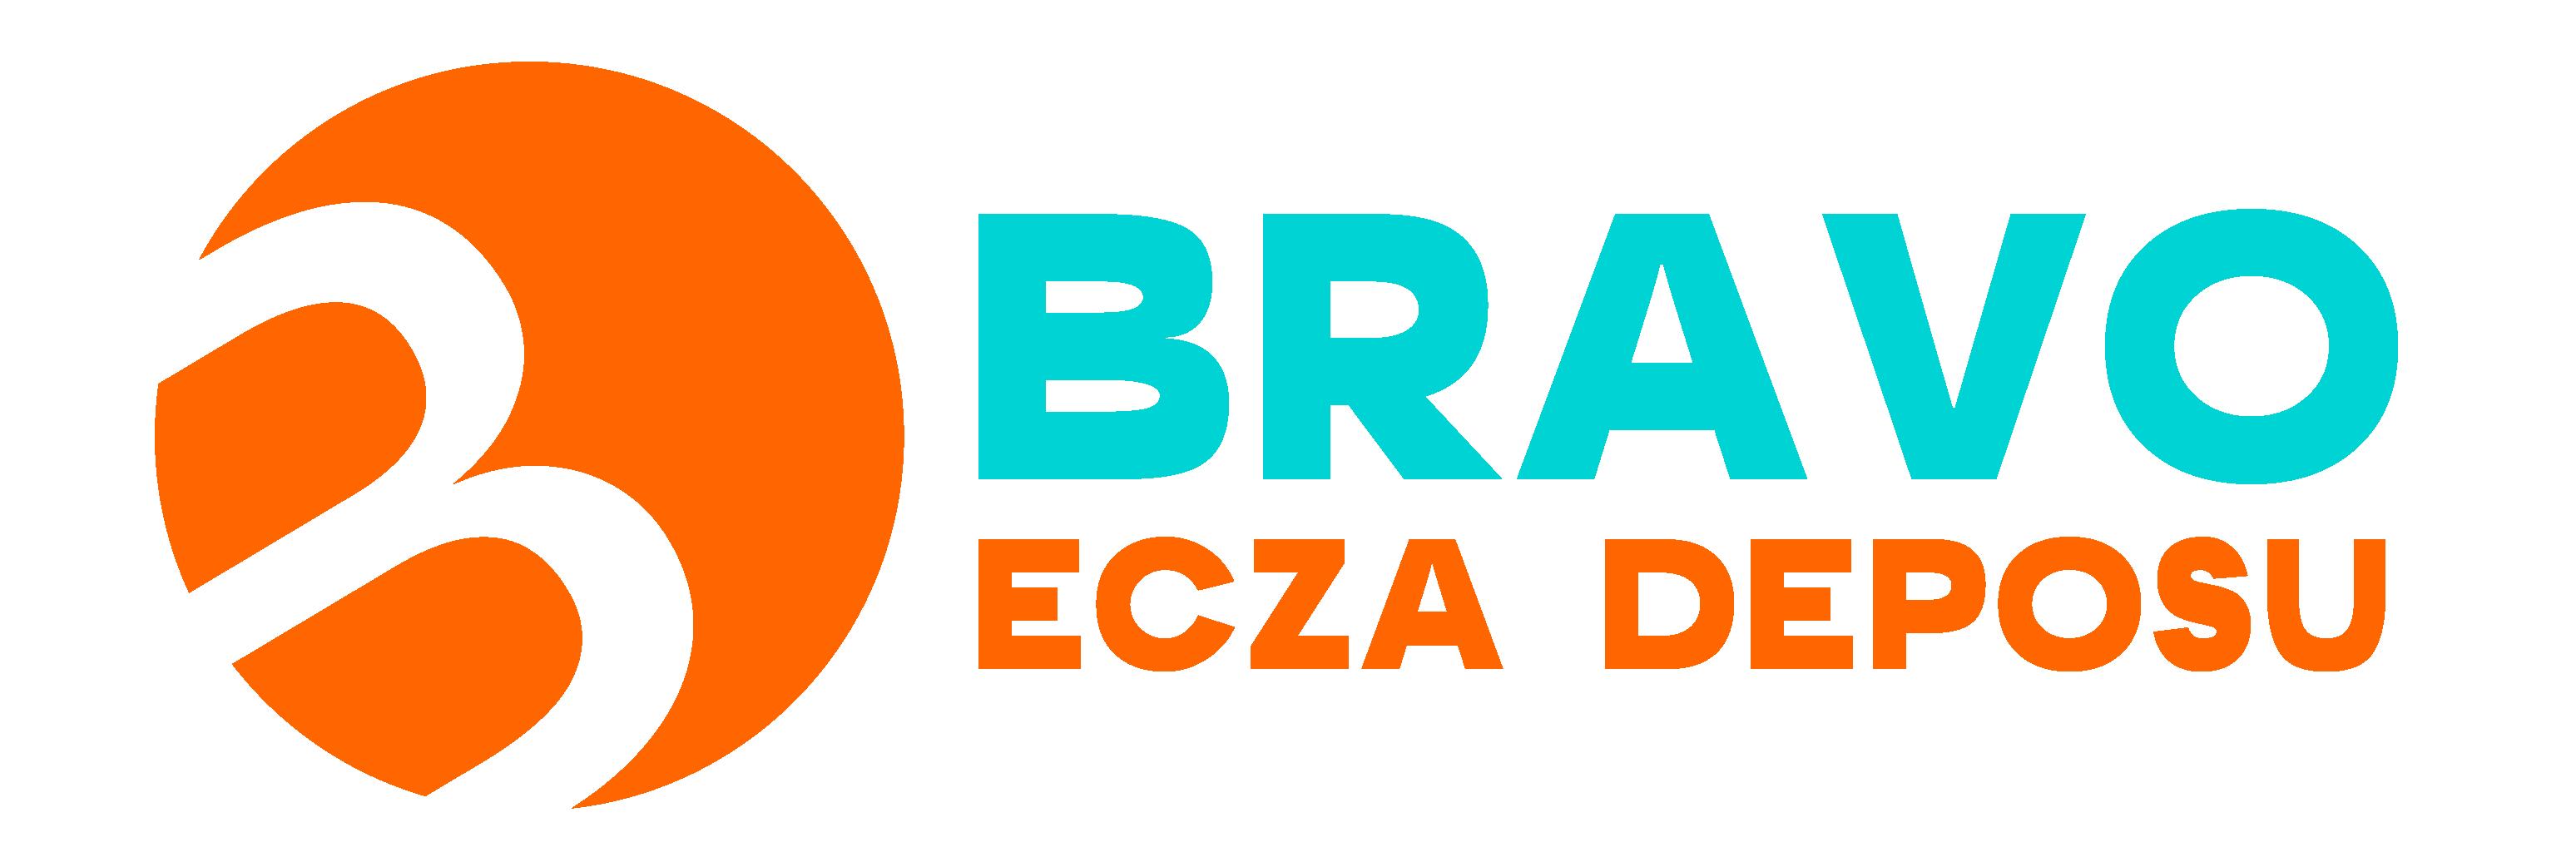 BRAVO ECZA DEPOSU PAZARLAMA VE TICARET LIMITED SIRKETI